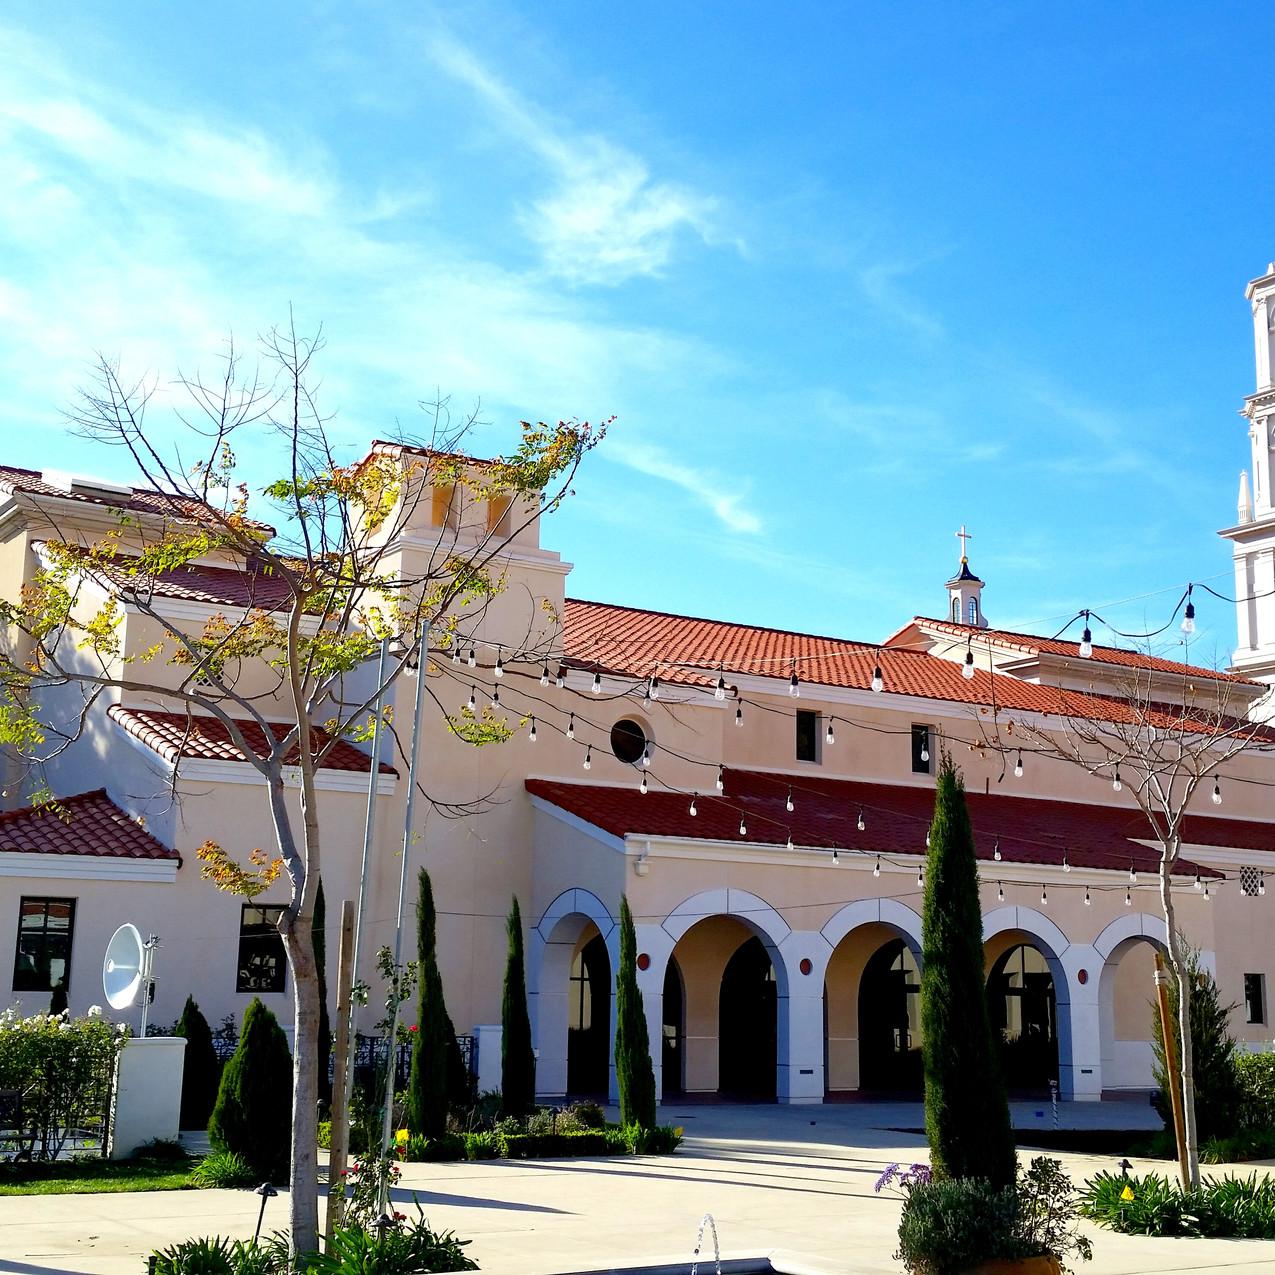 St. Cecilia Exterior